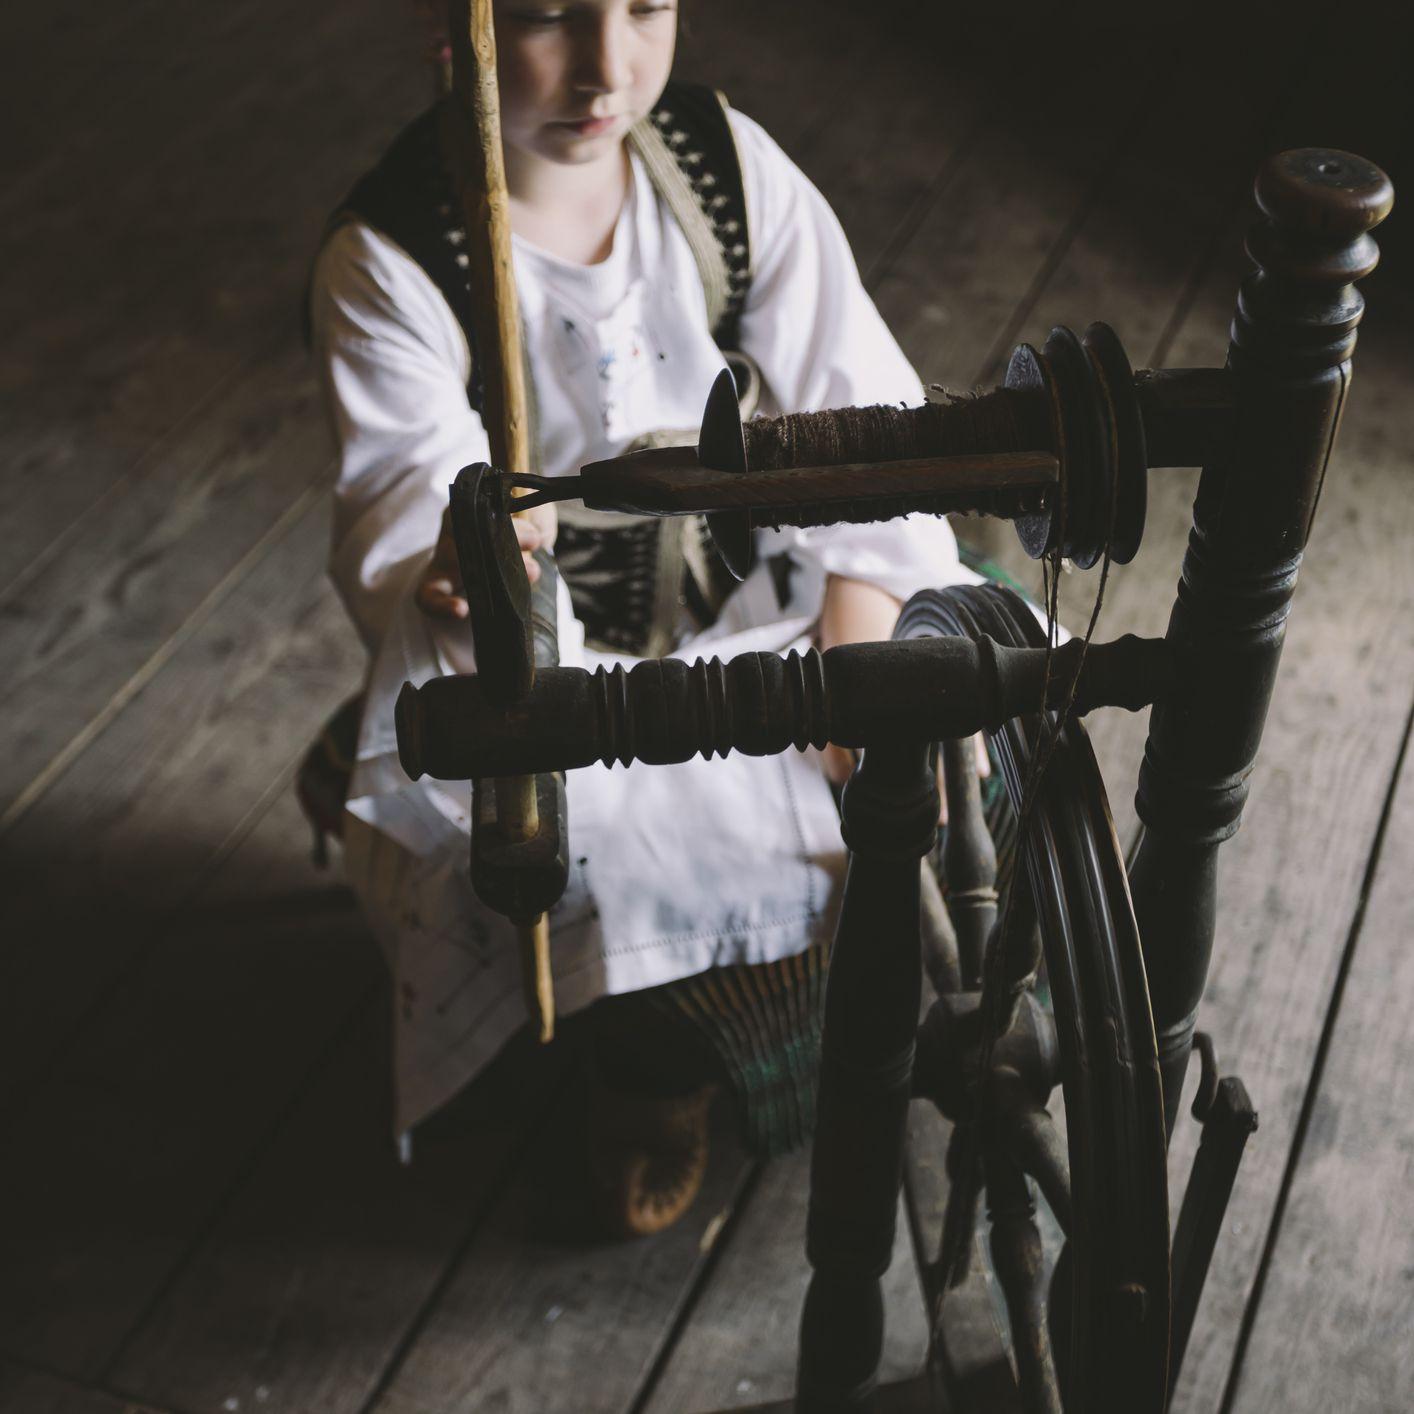 Child at spinning wheel